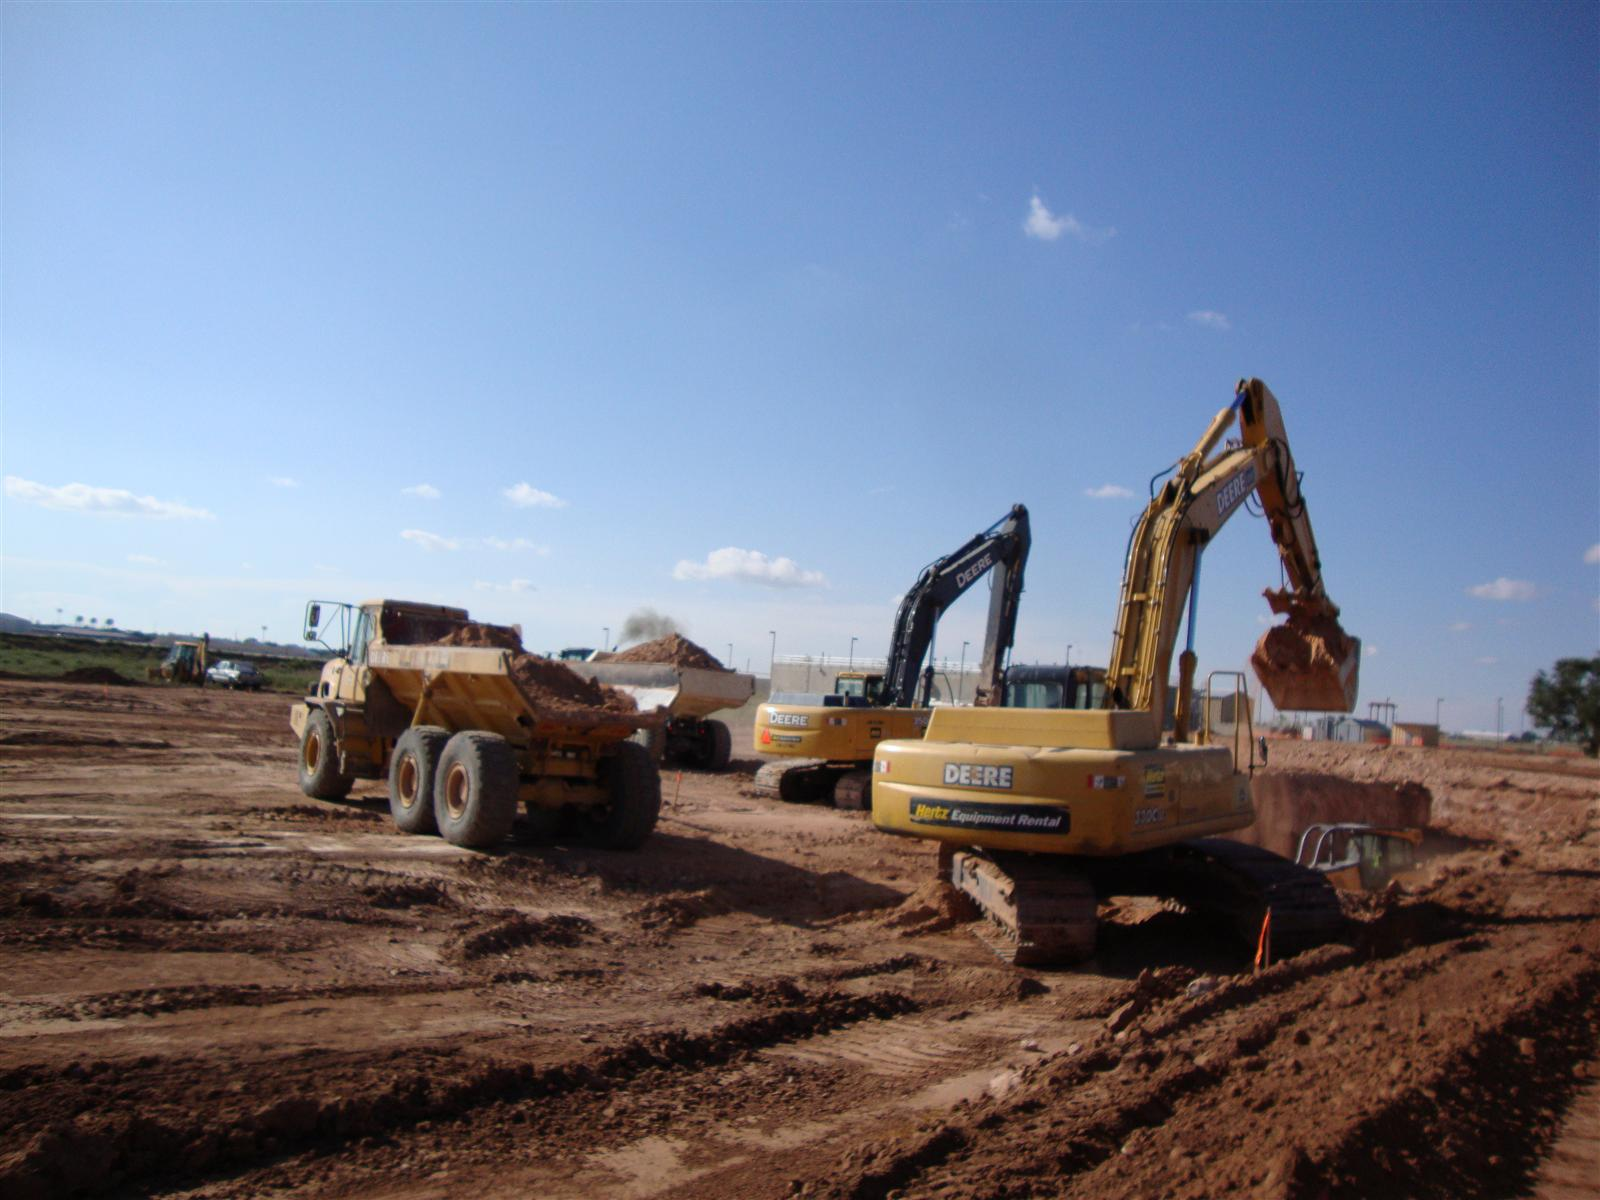 Prva gradbena faza, vir: www.hdrinc.com